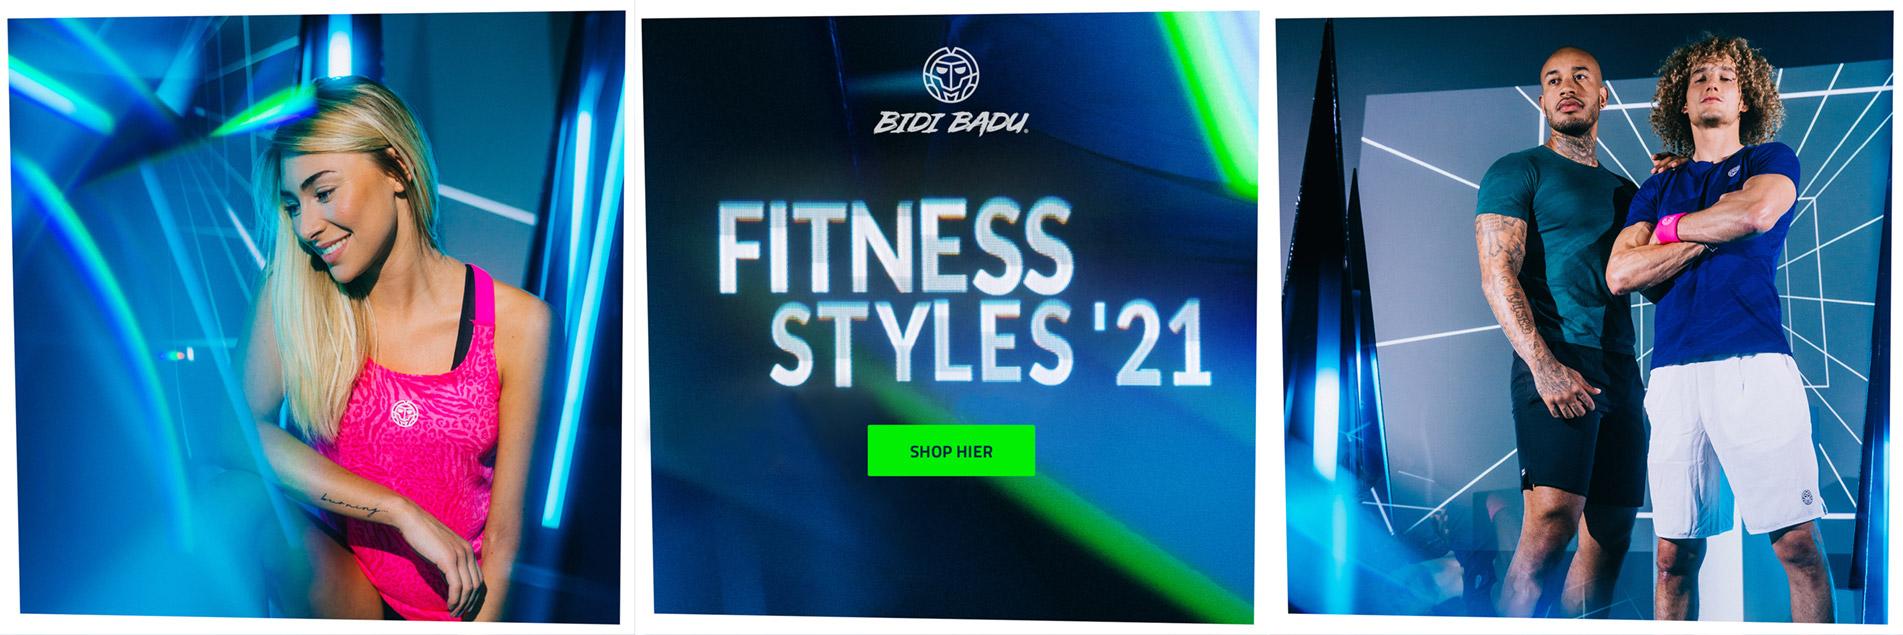 Bidi Badu | Fitness Styles''21